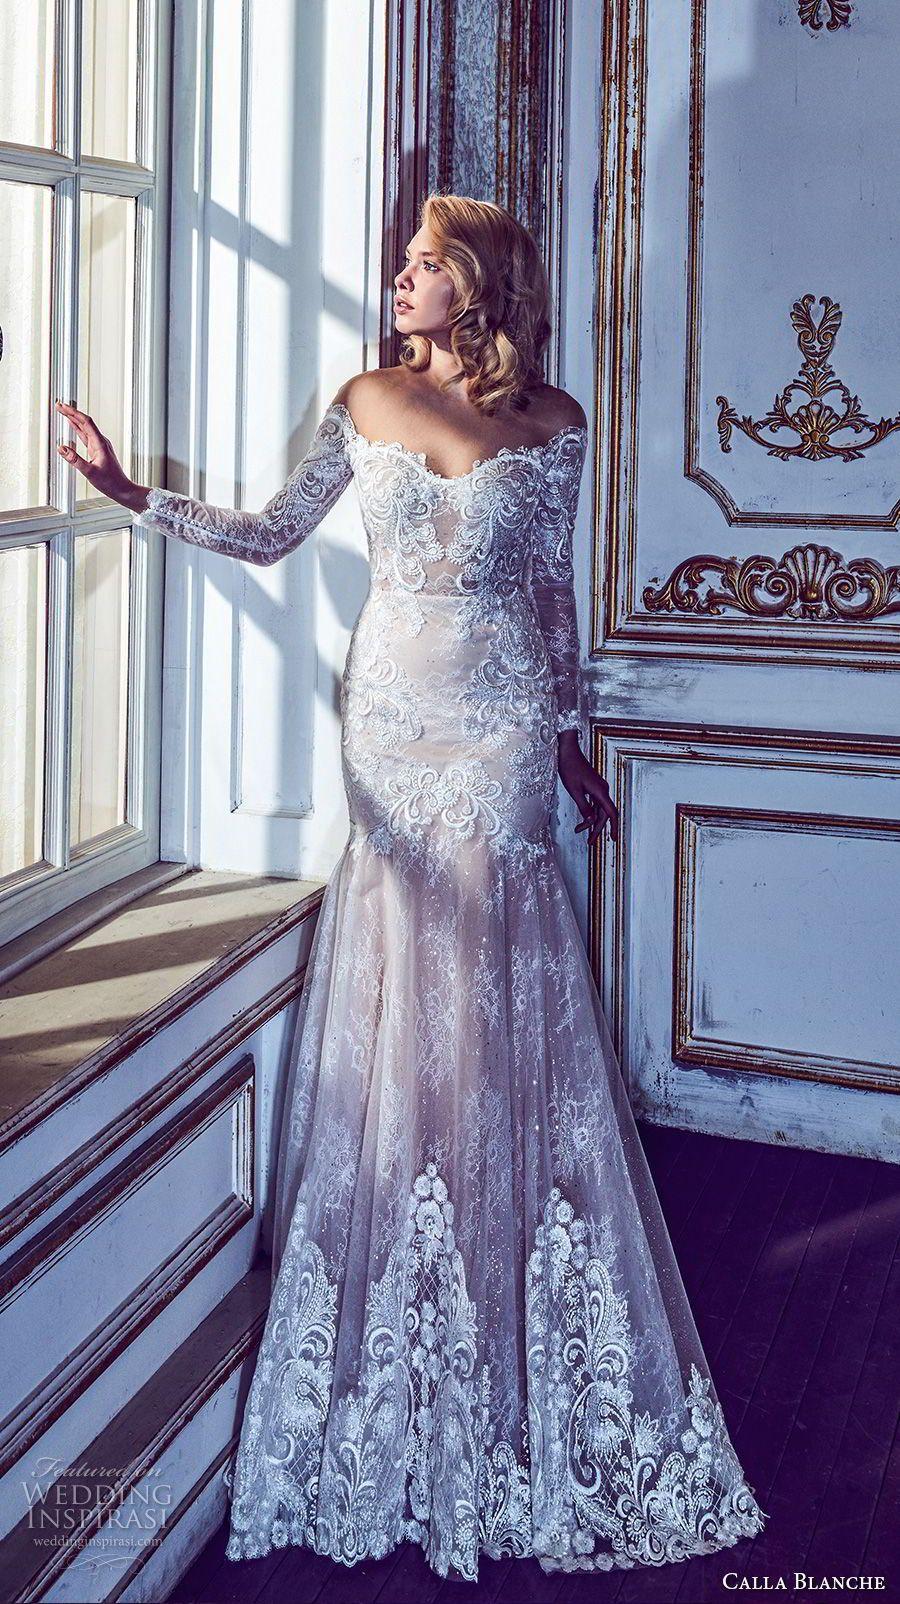 Calla blanche fall wedding dresses chapel train wedding